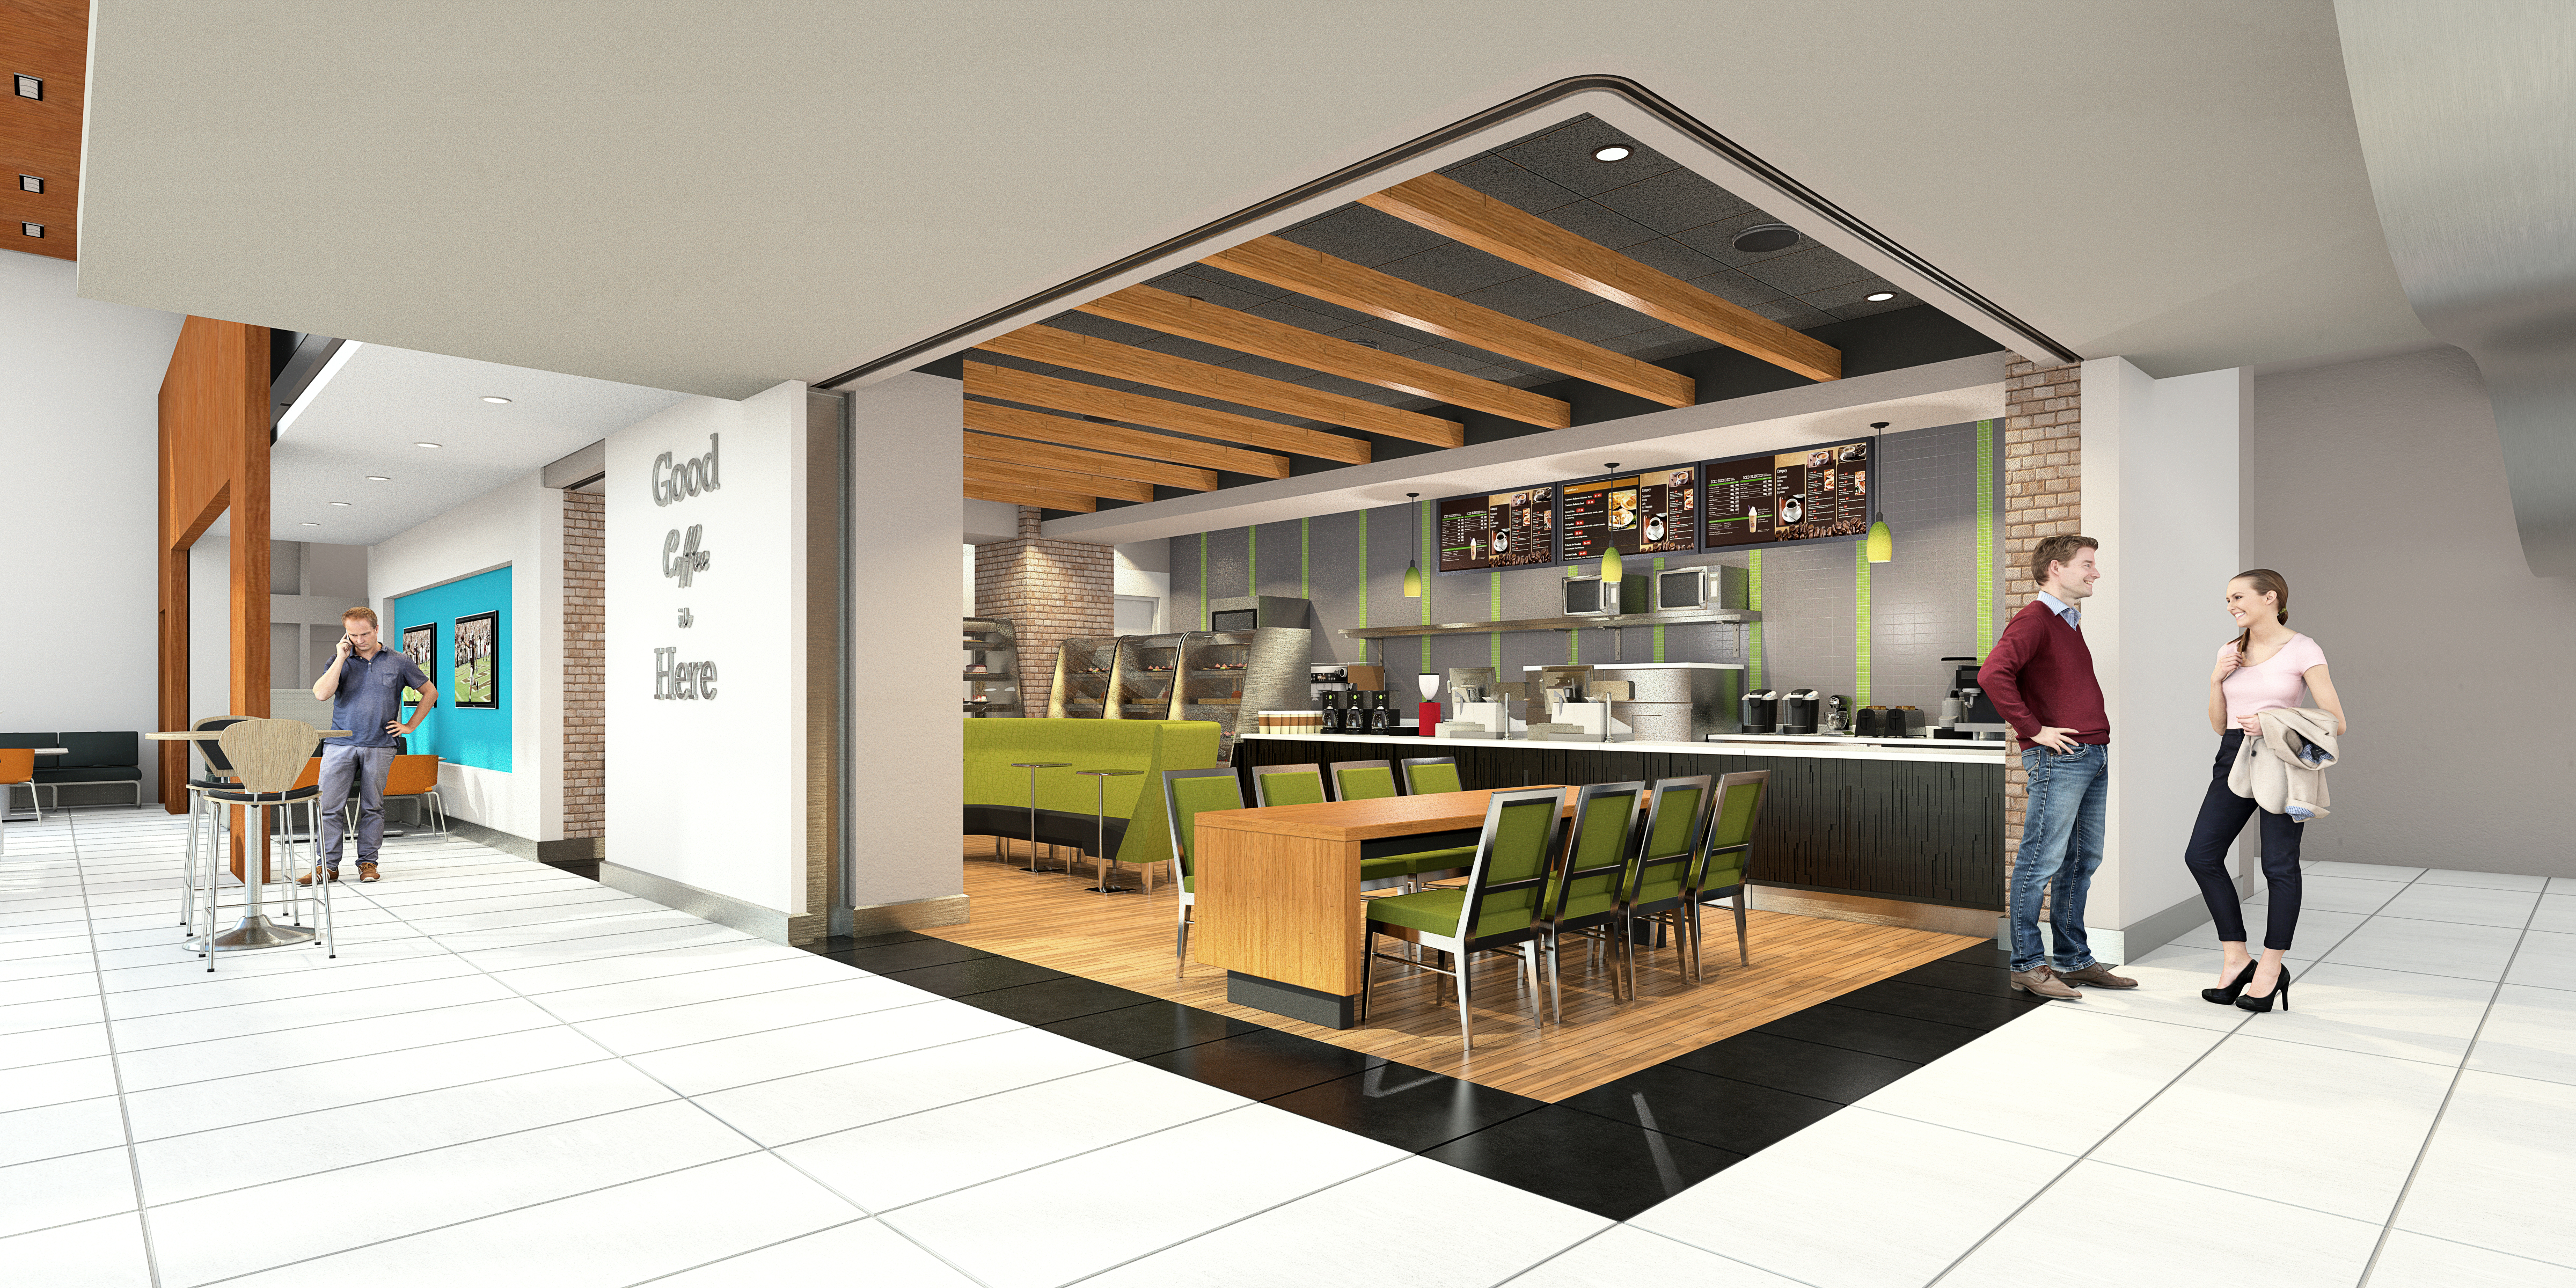 Coffee-Shop-Rendering-1_TAMU-Student-Housing-1